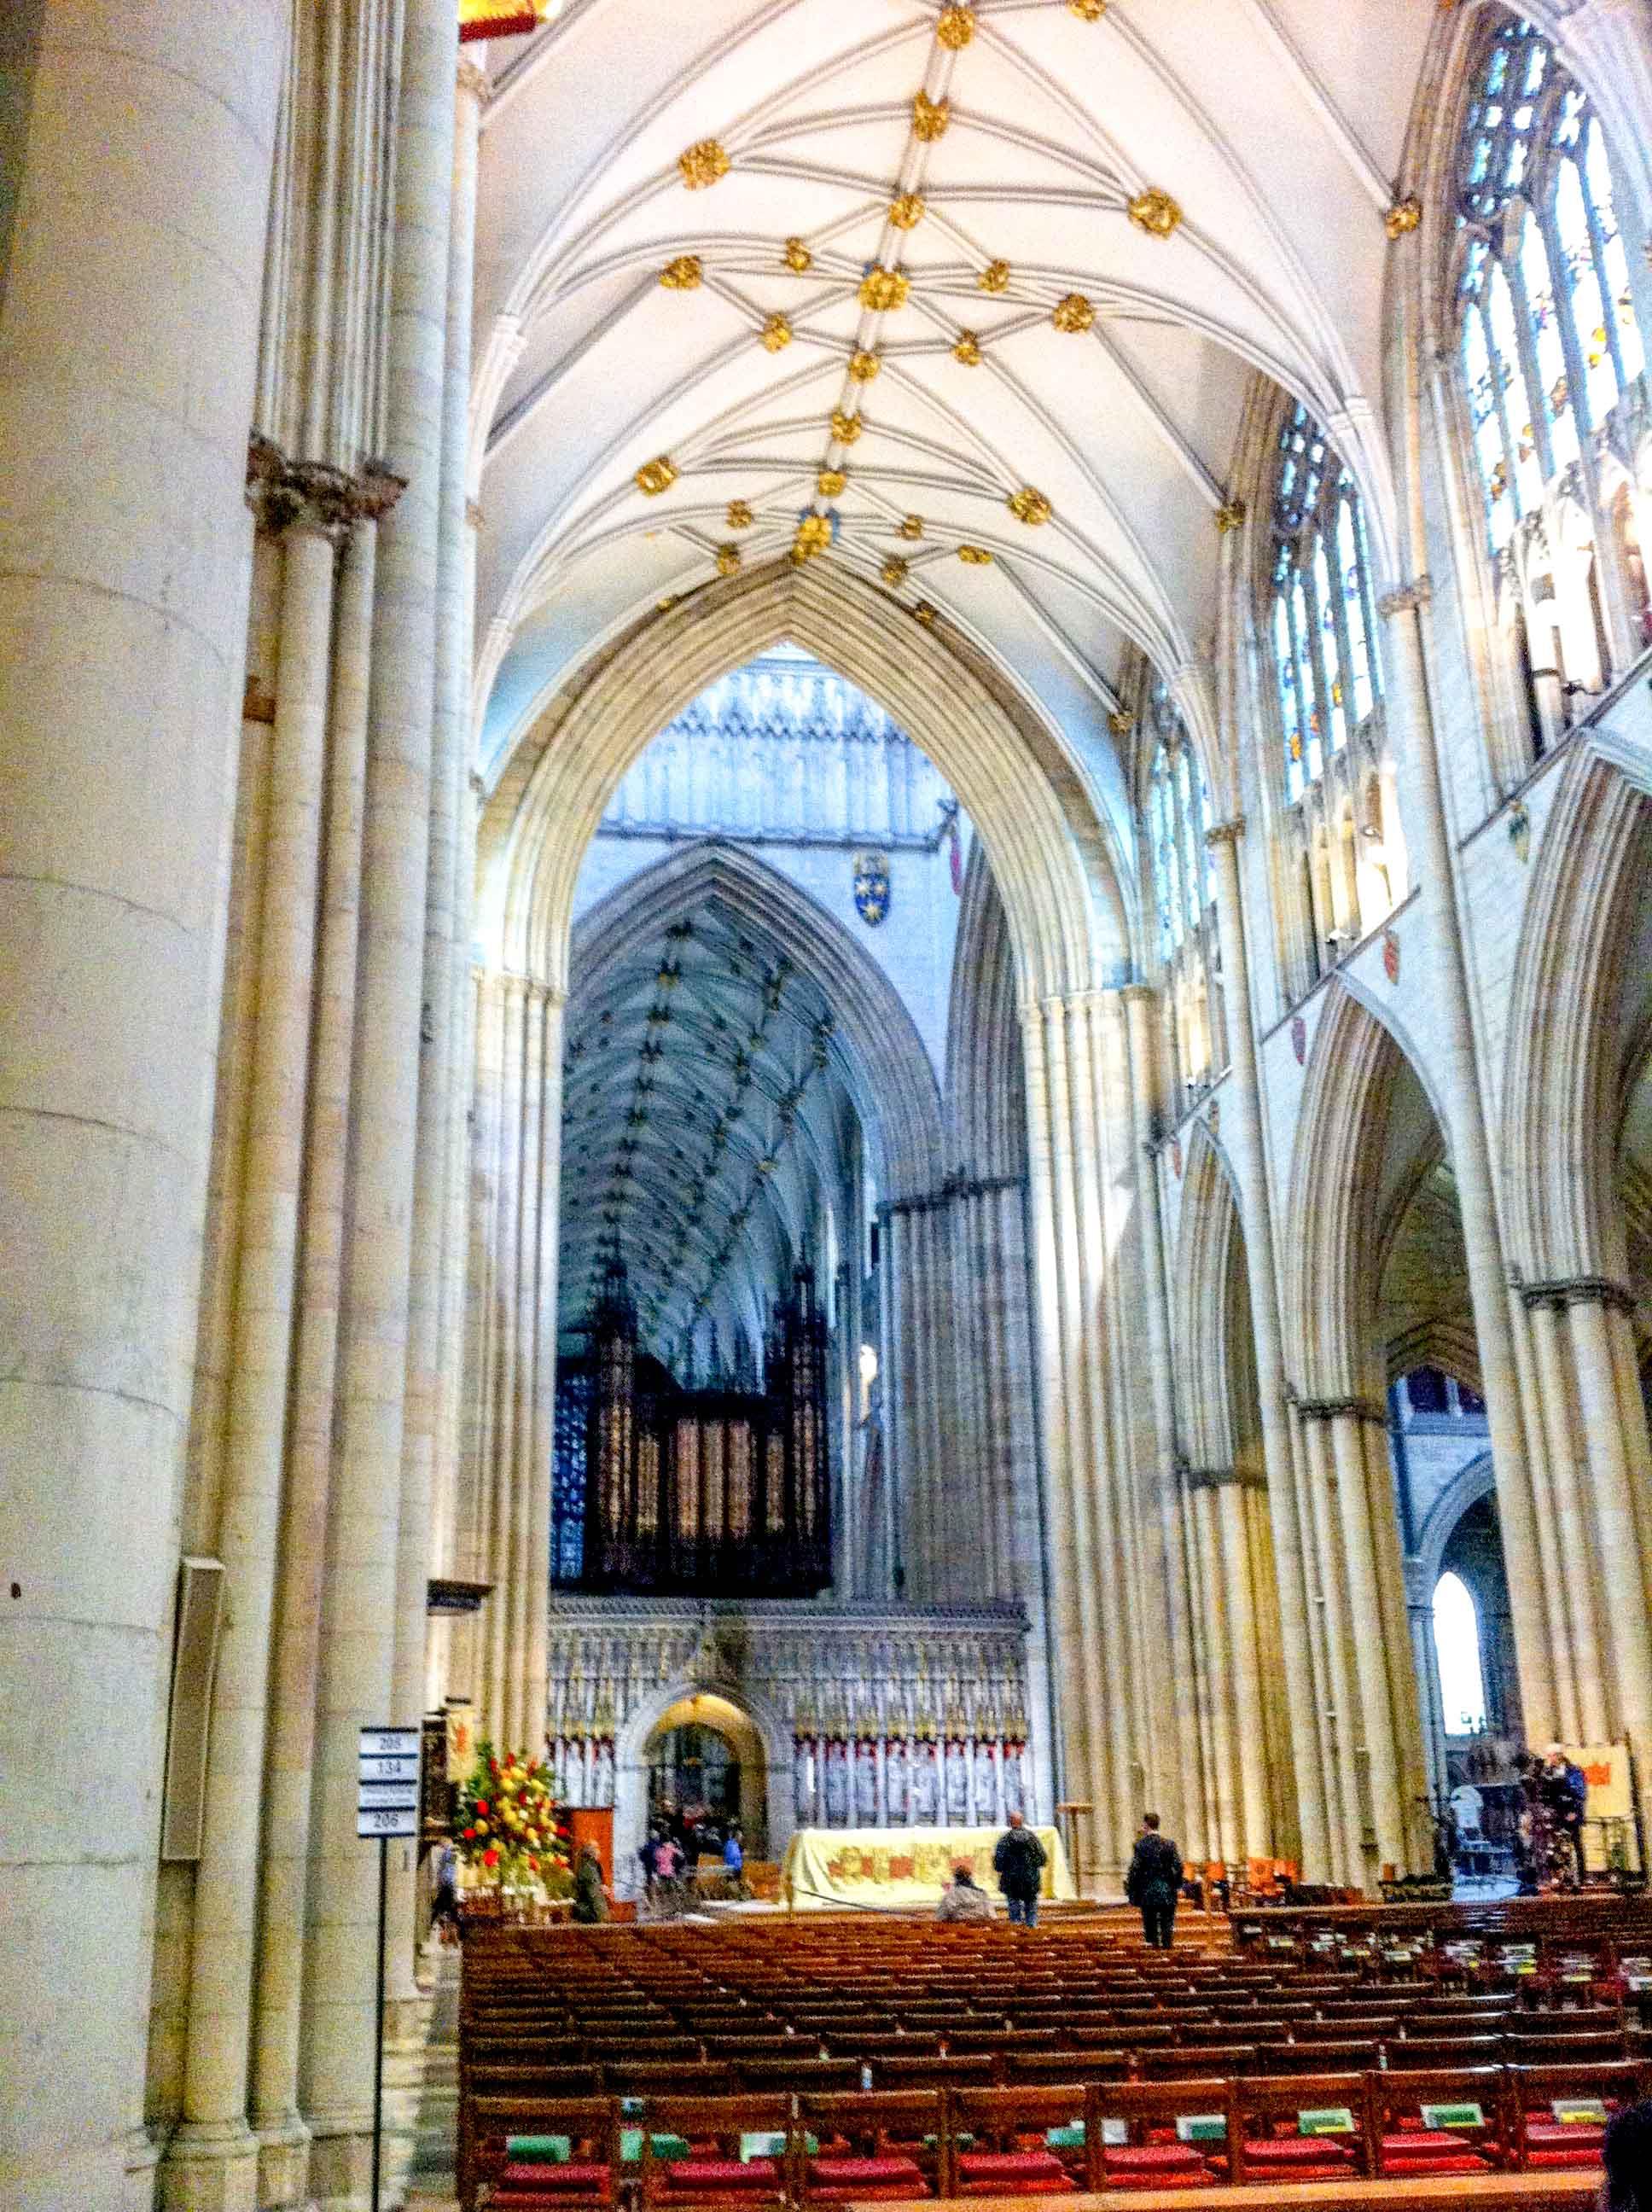 Gothic York Minster in York city, Yorkshire, England.